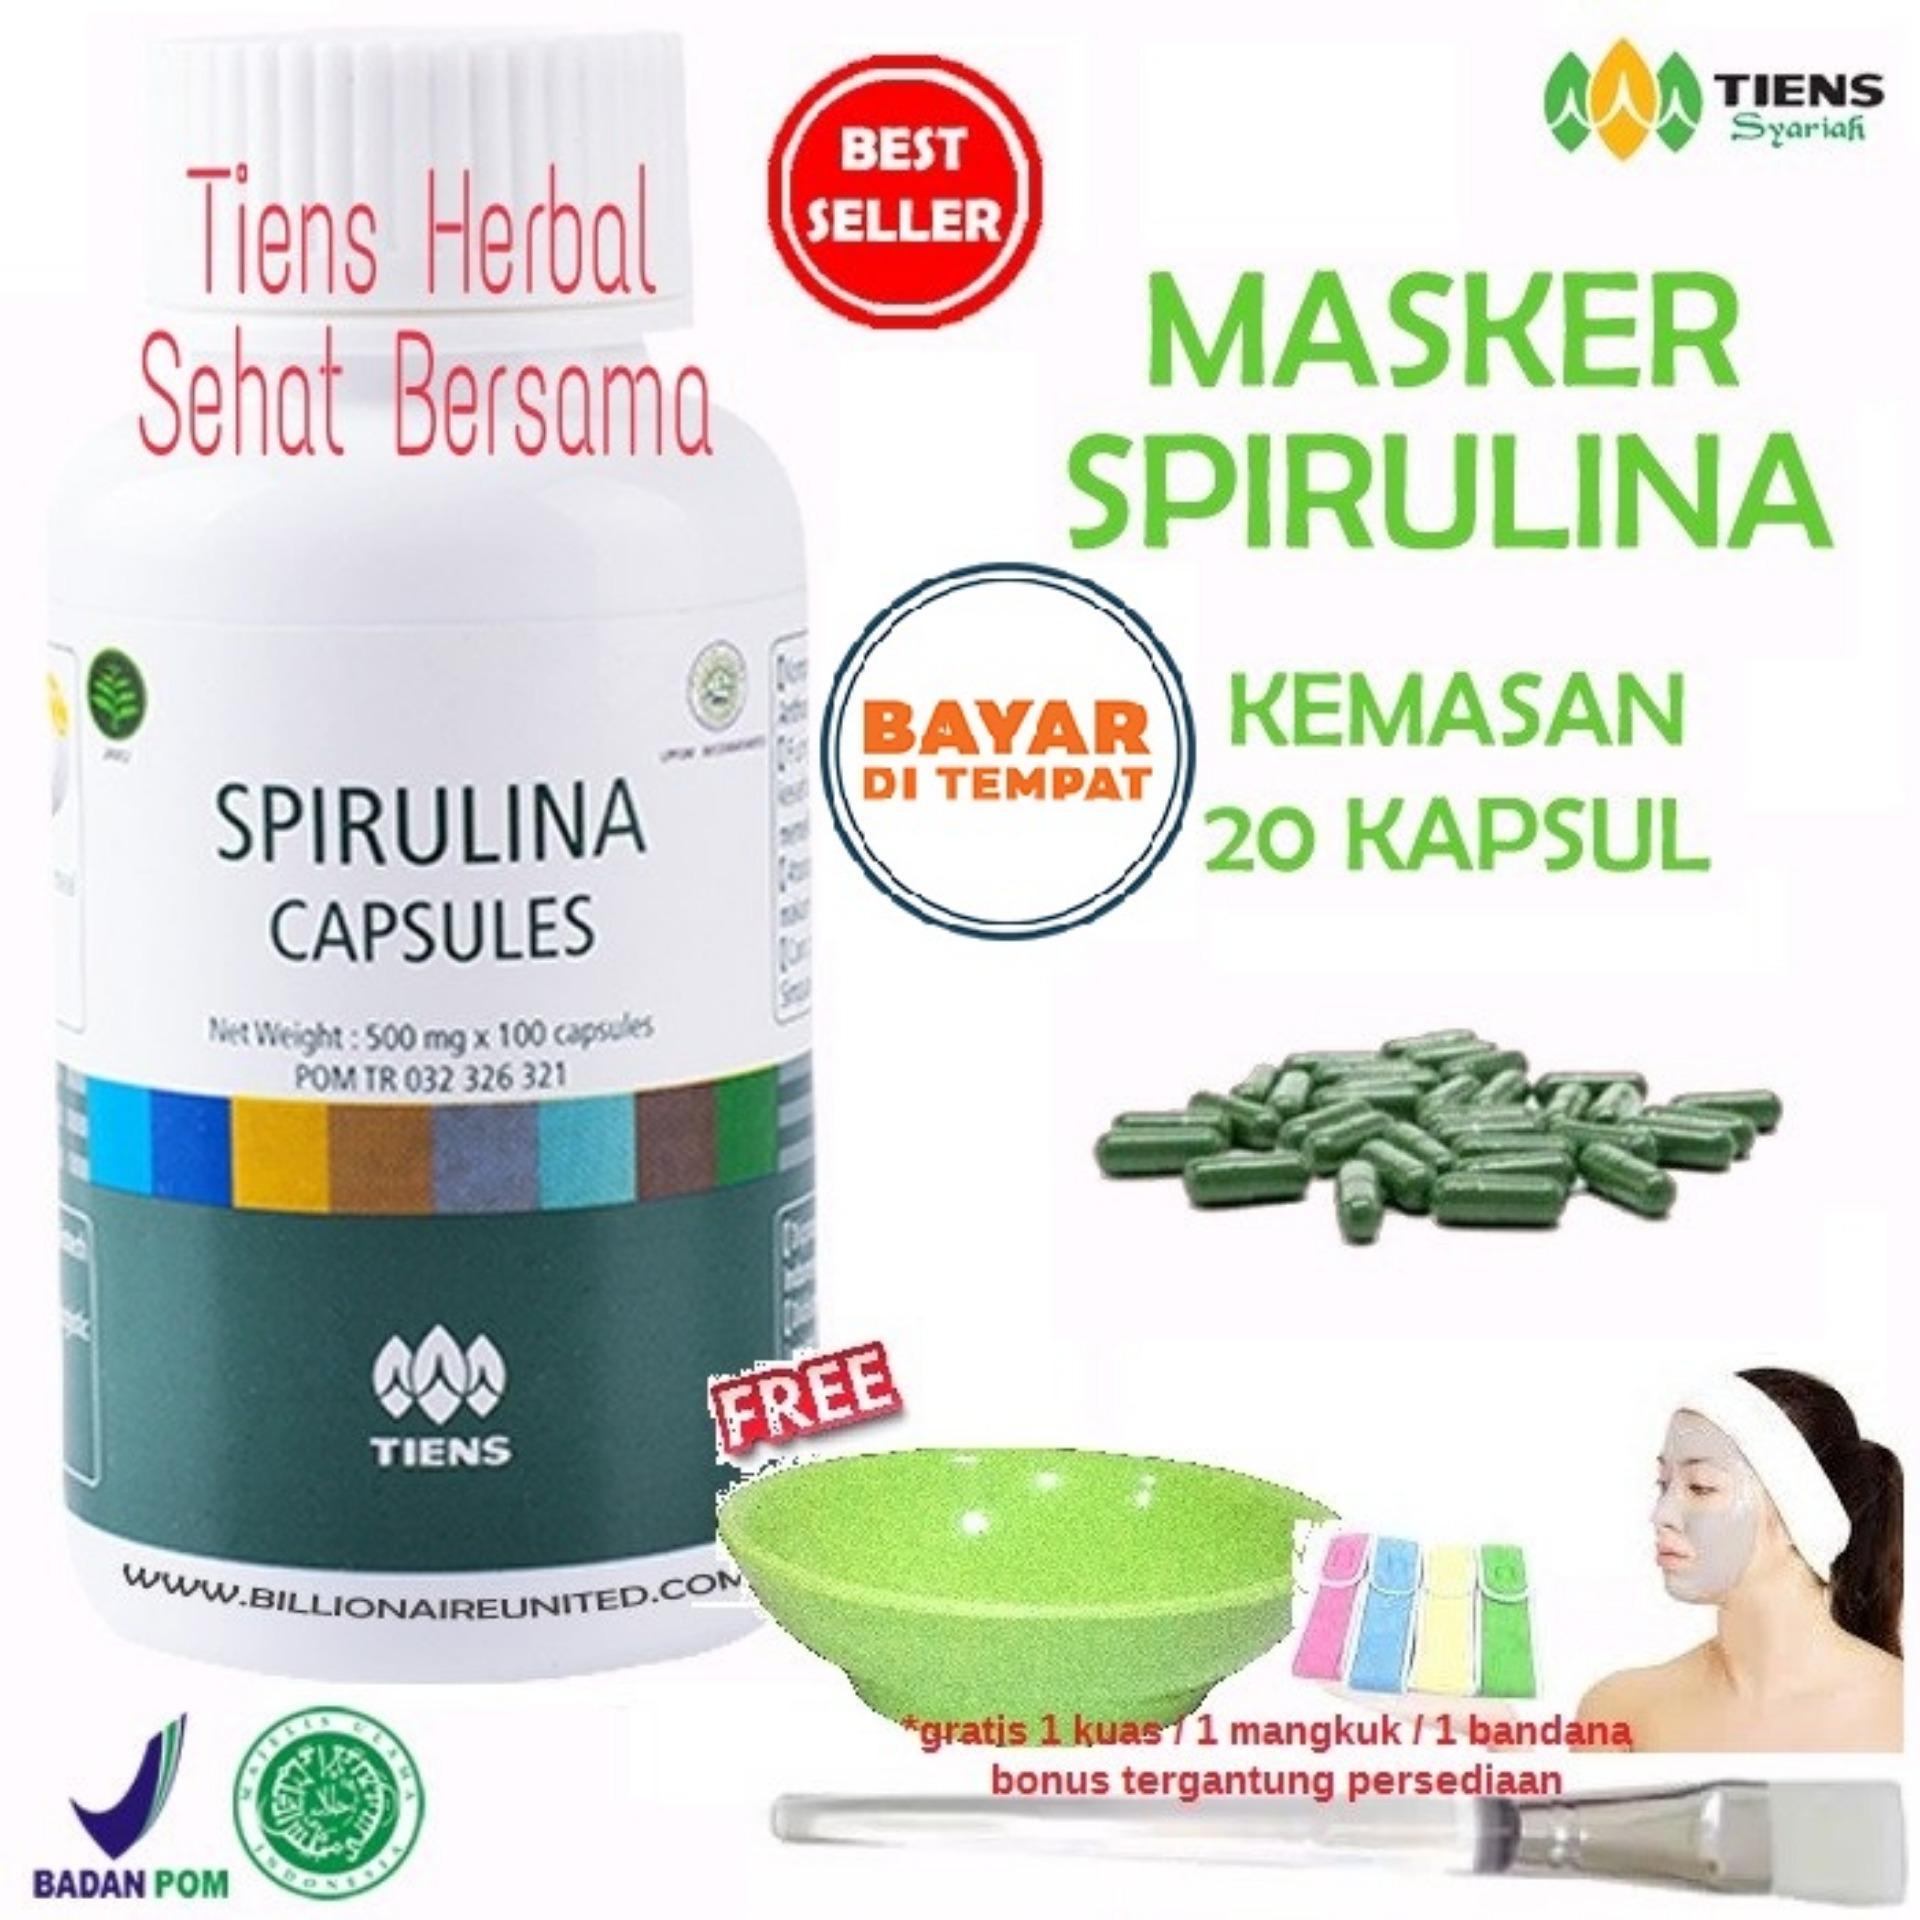 Herbal Alami Masker Spirulina Tiens Herbal Pemutih Wajah Paket 20 Kapsul Gratis Kuas